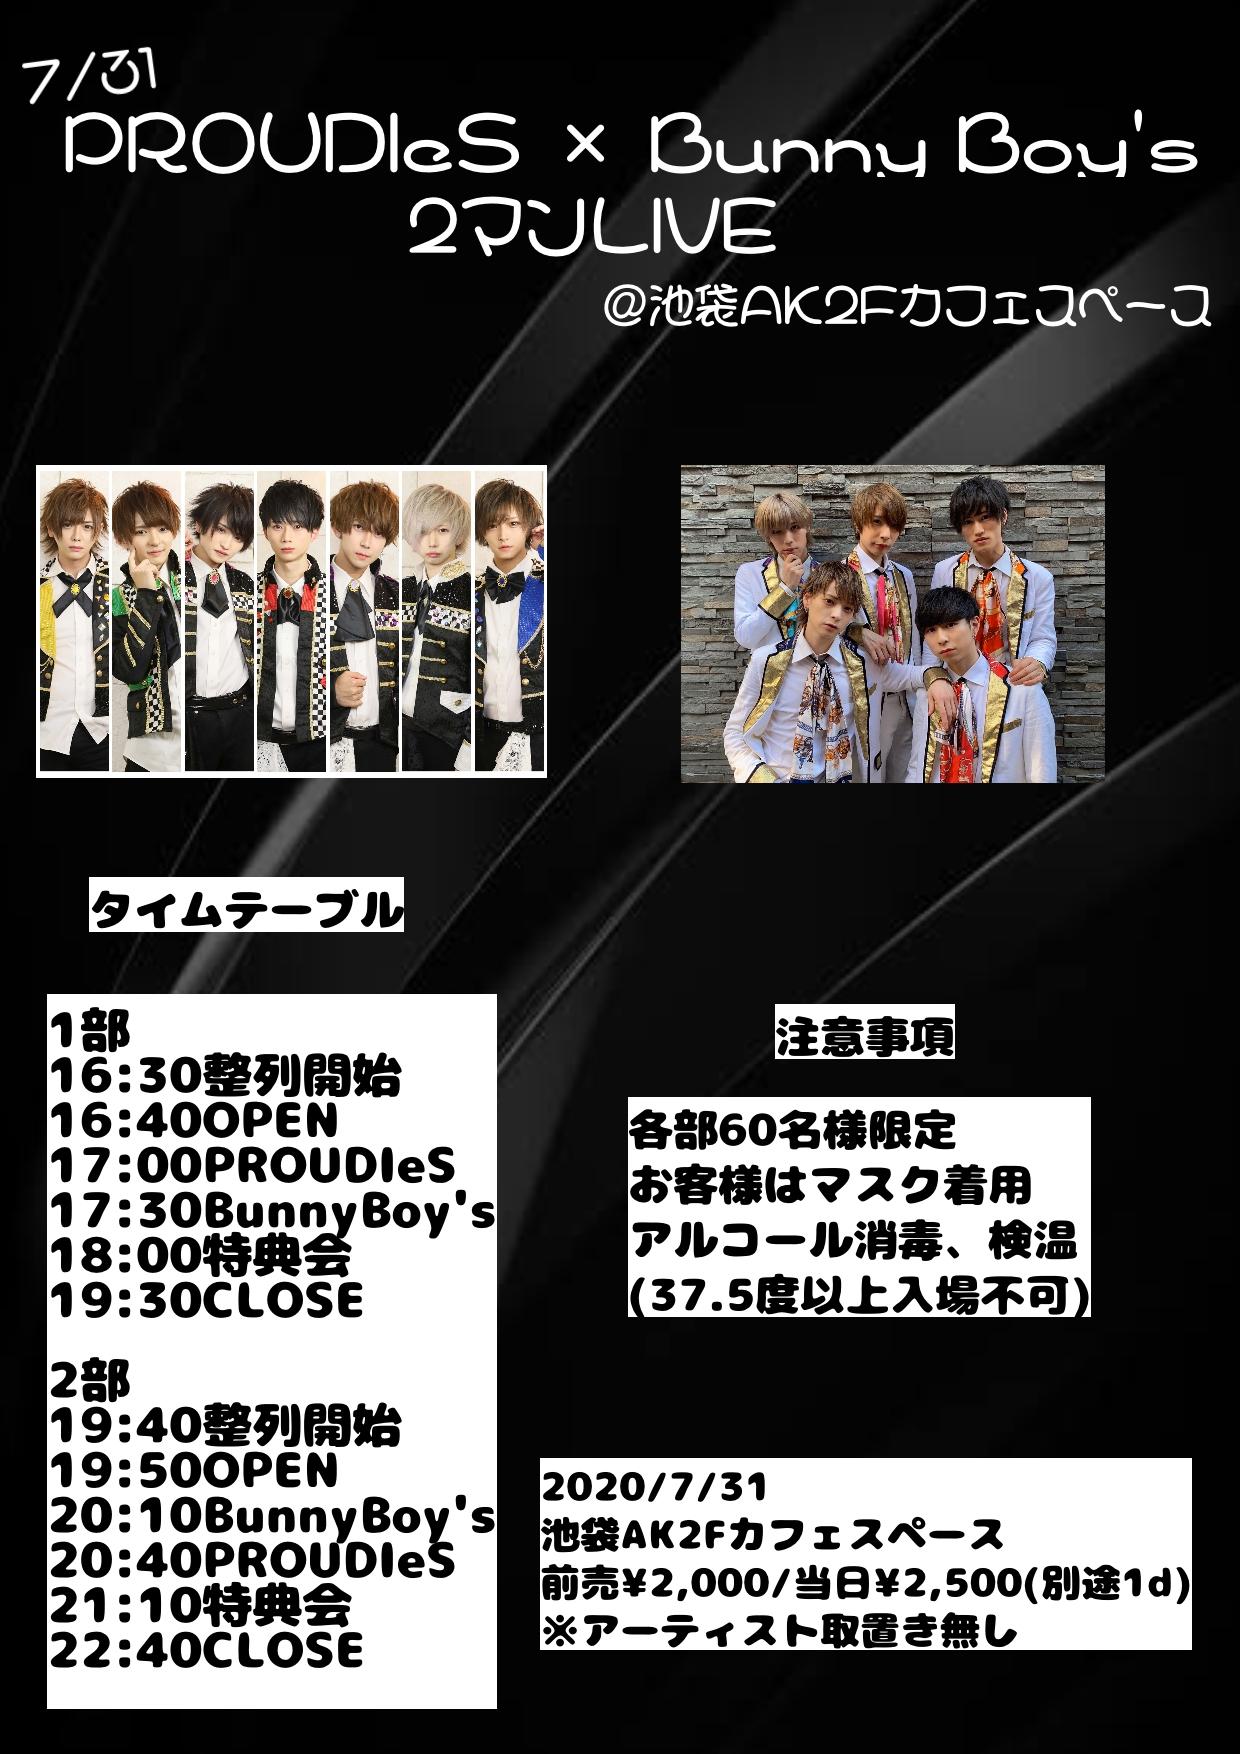 PD × Bunny Boy's 2マンLIVE